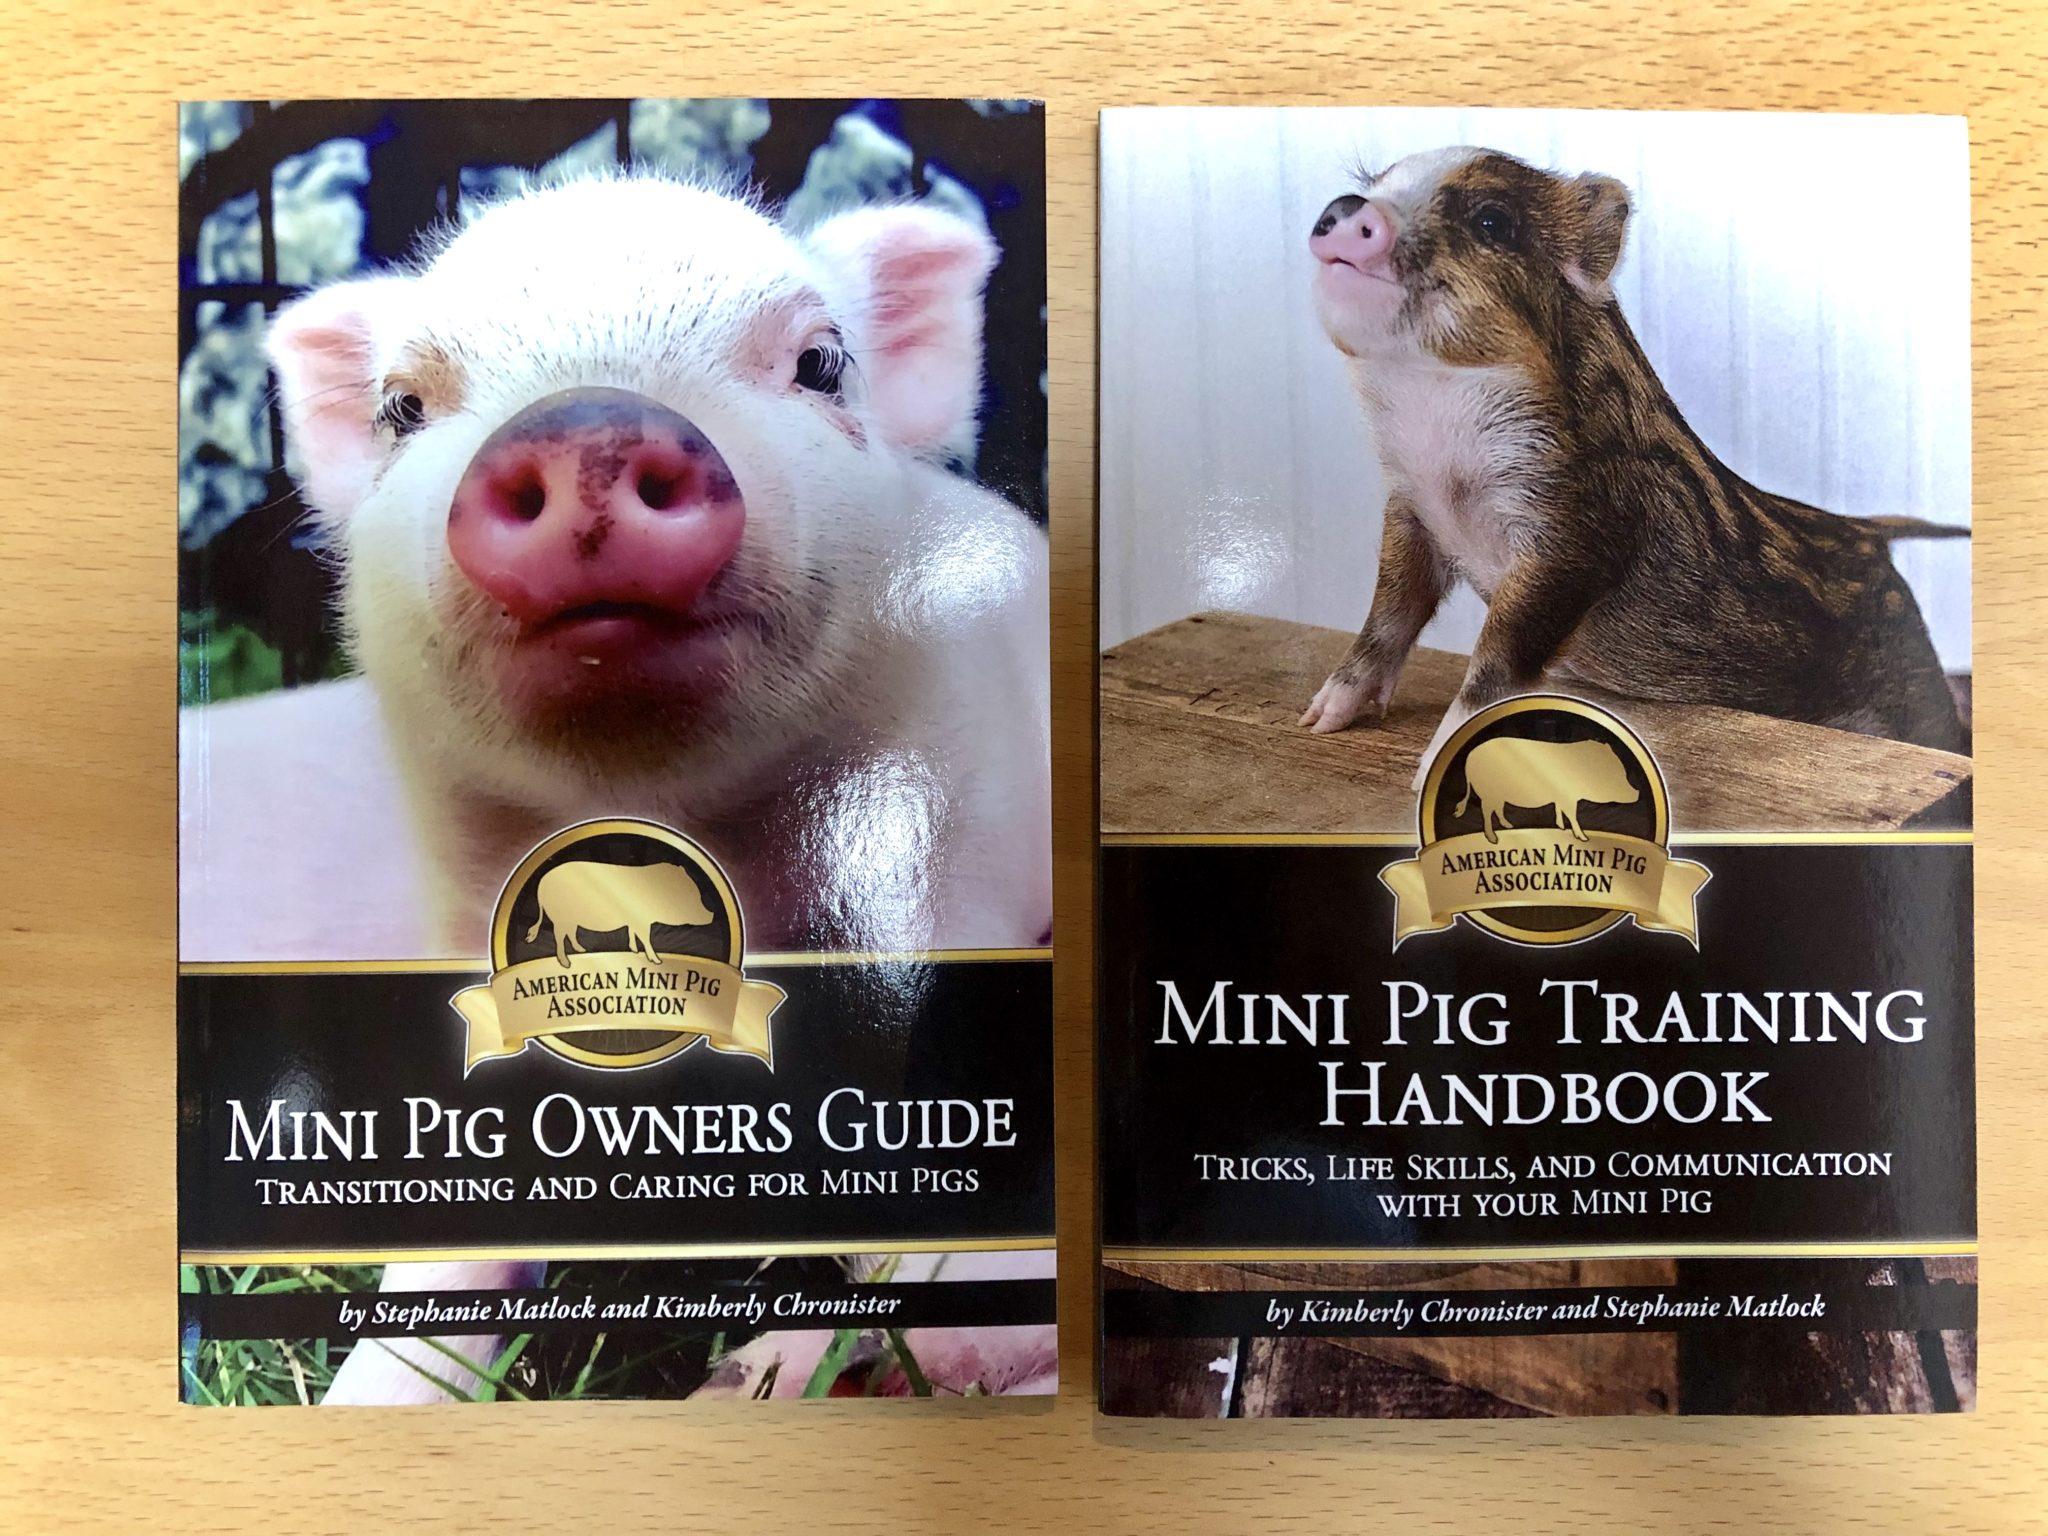 american mini pig association